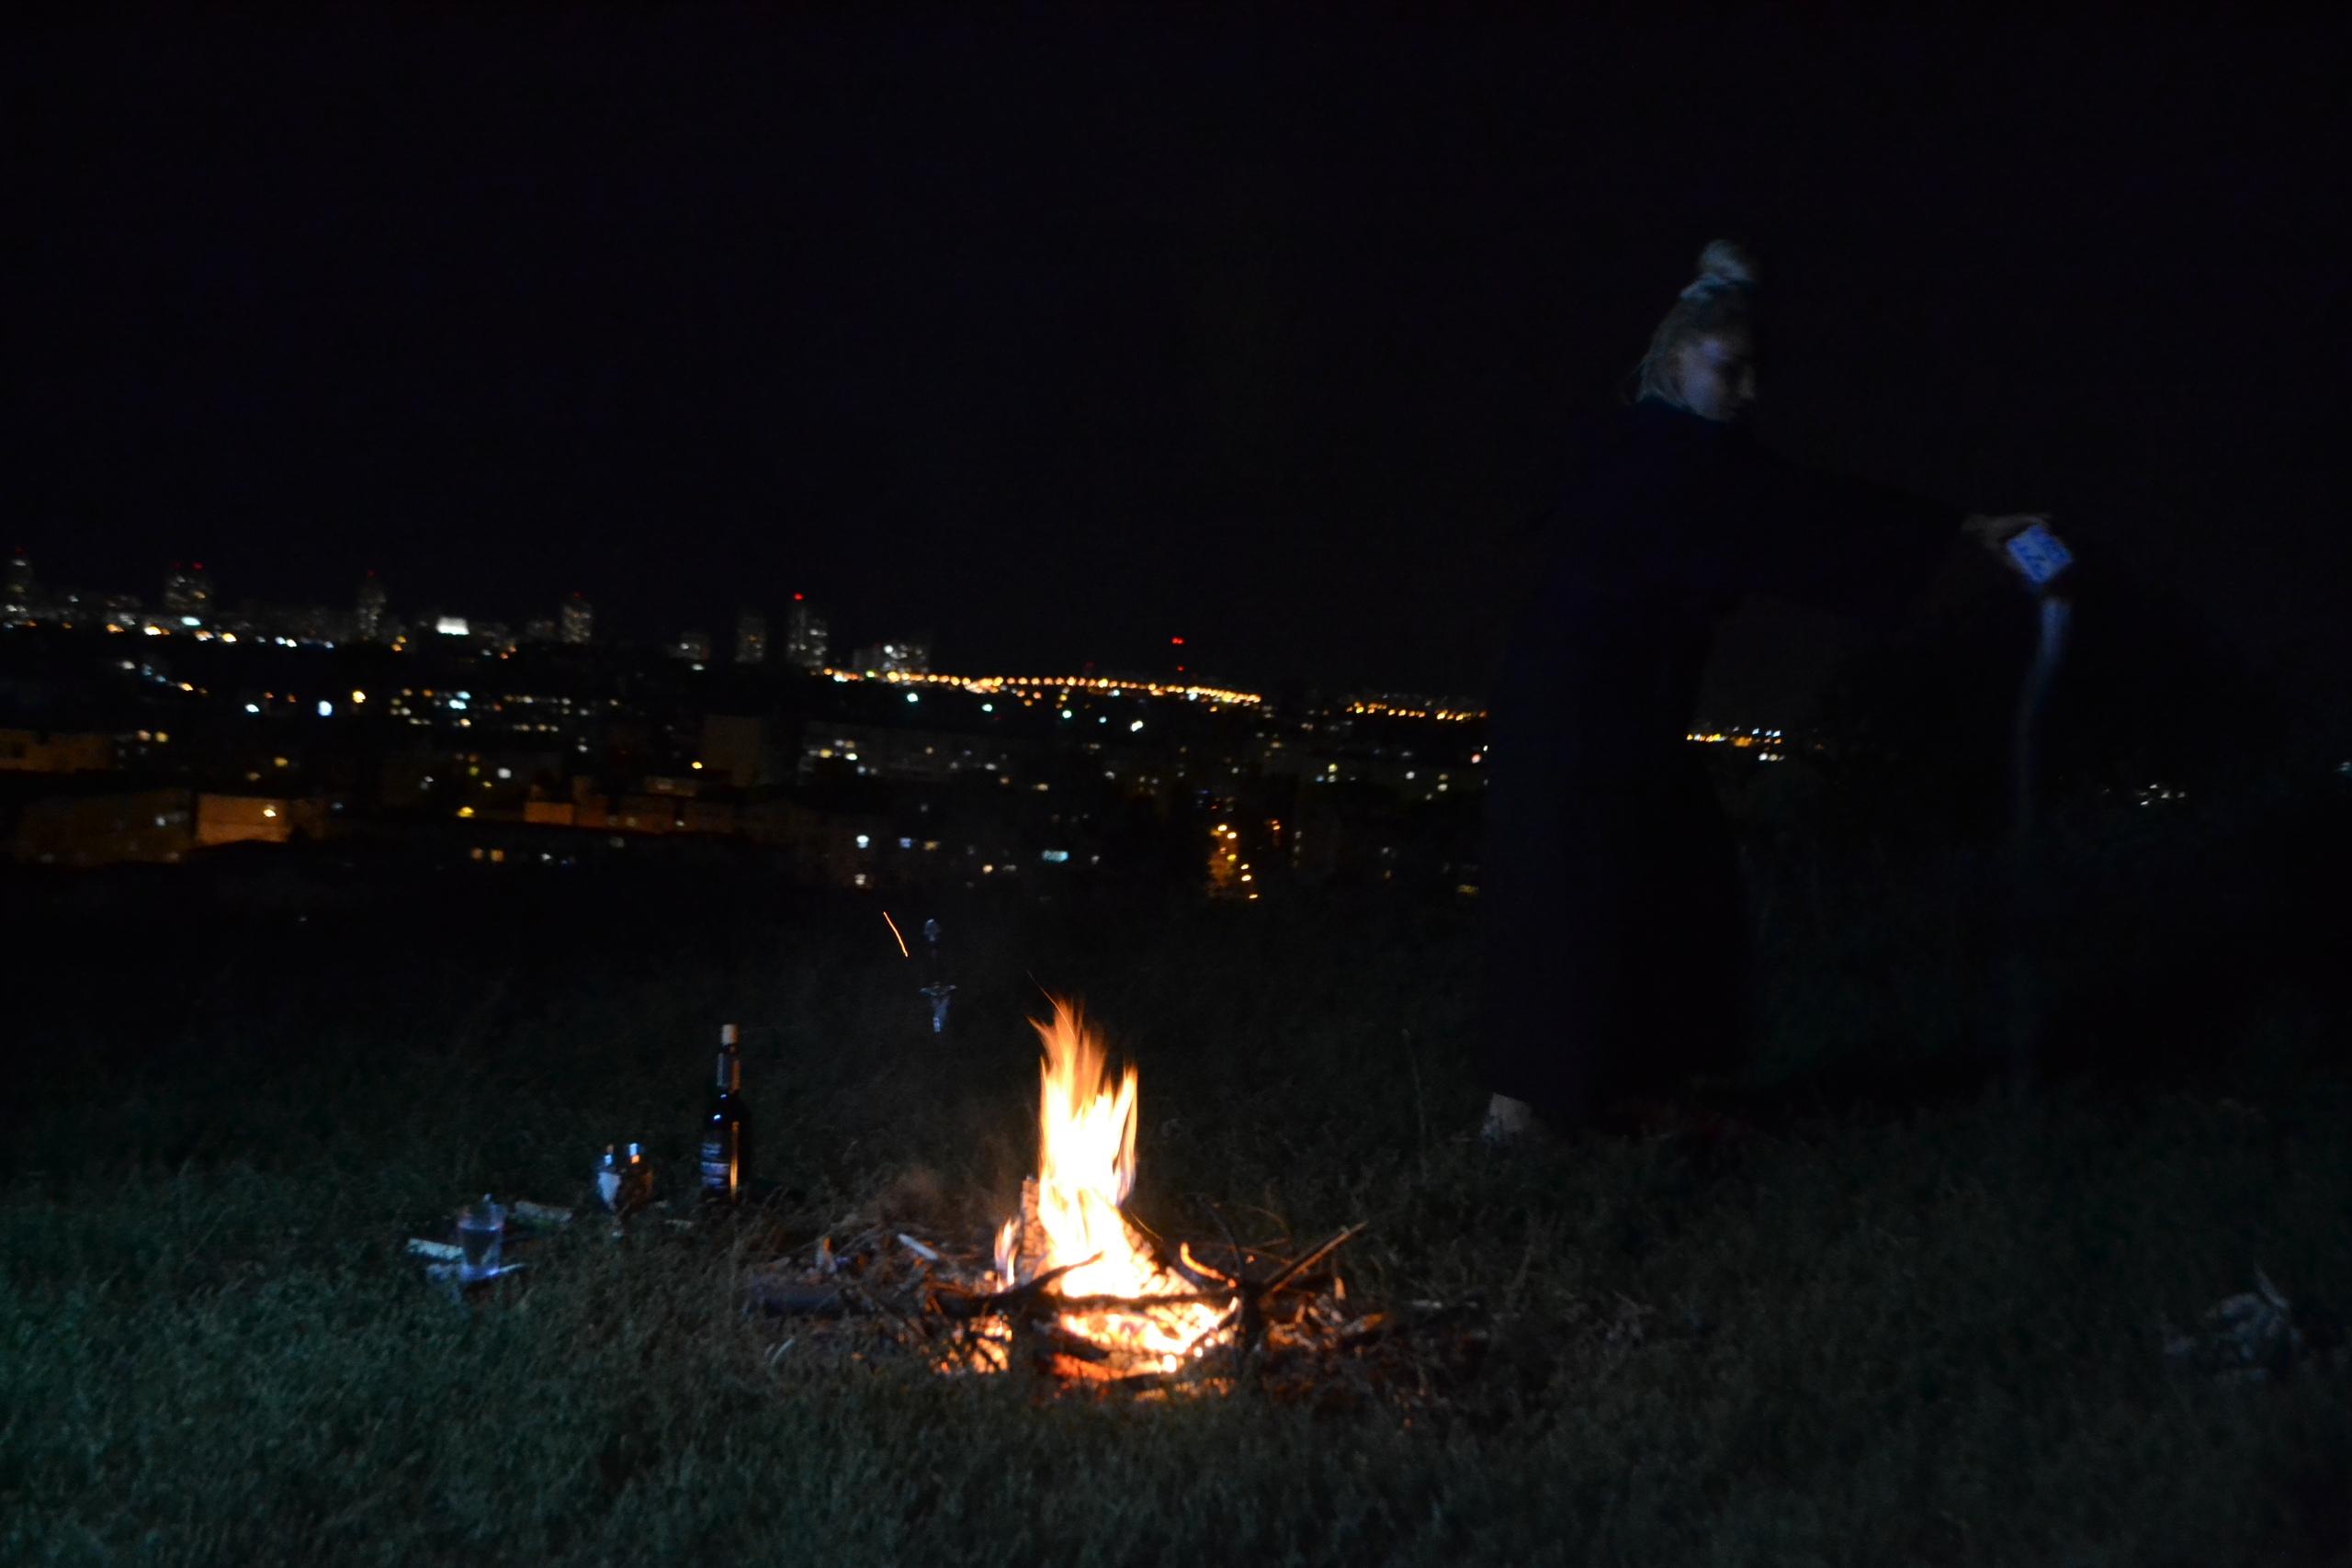 Елена Руденко (Валтея). Украина. Киев. Гора Щековица. Закрытый обряд. 2018 г . (ФОТО). WazV64kg8yA